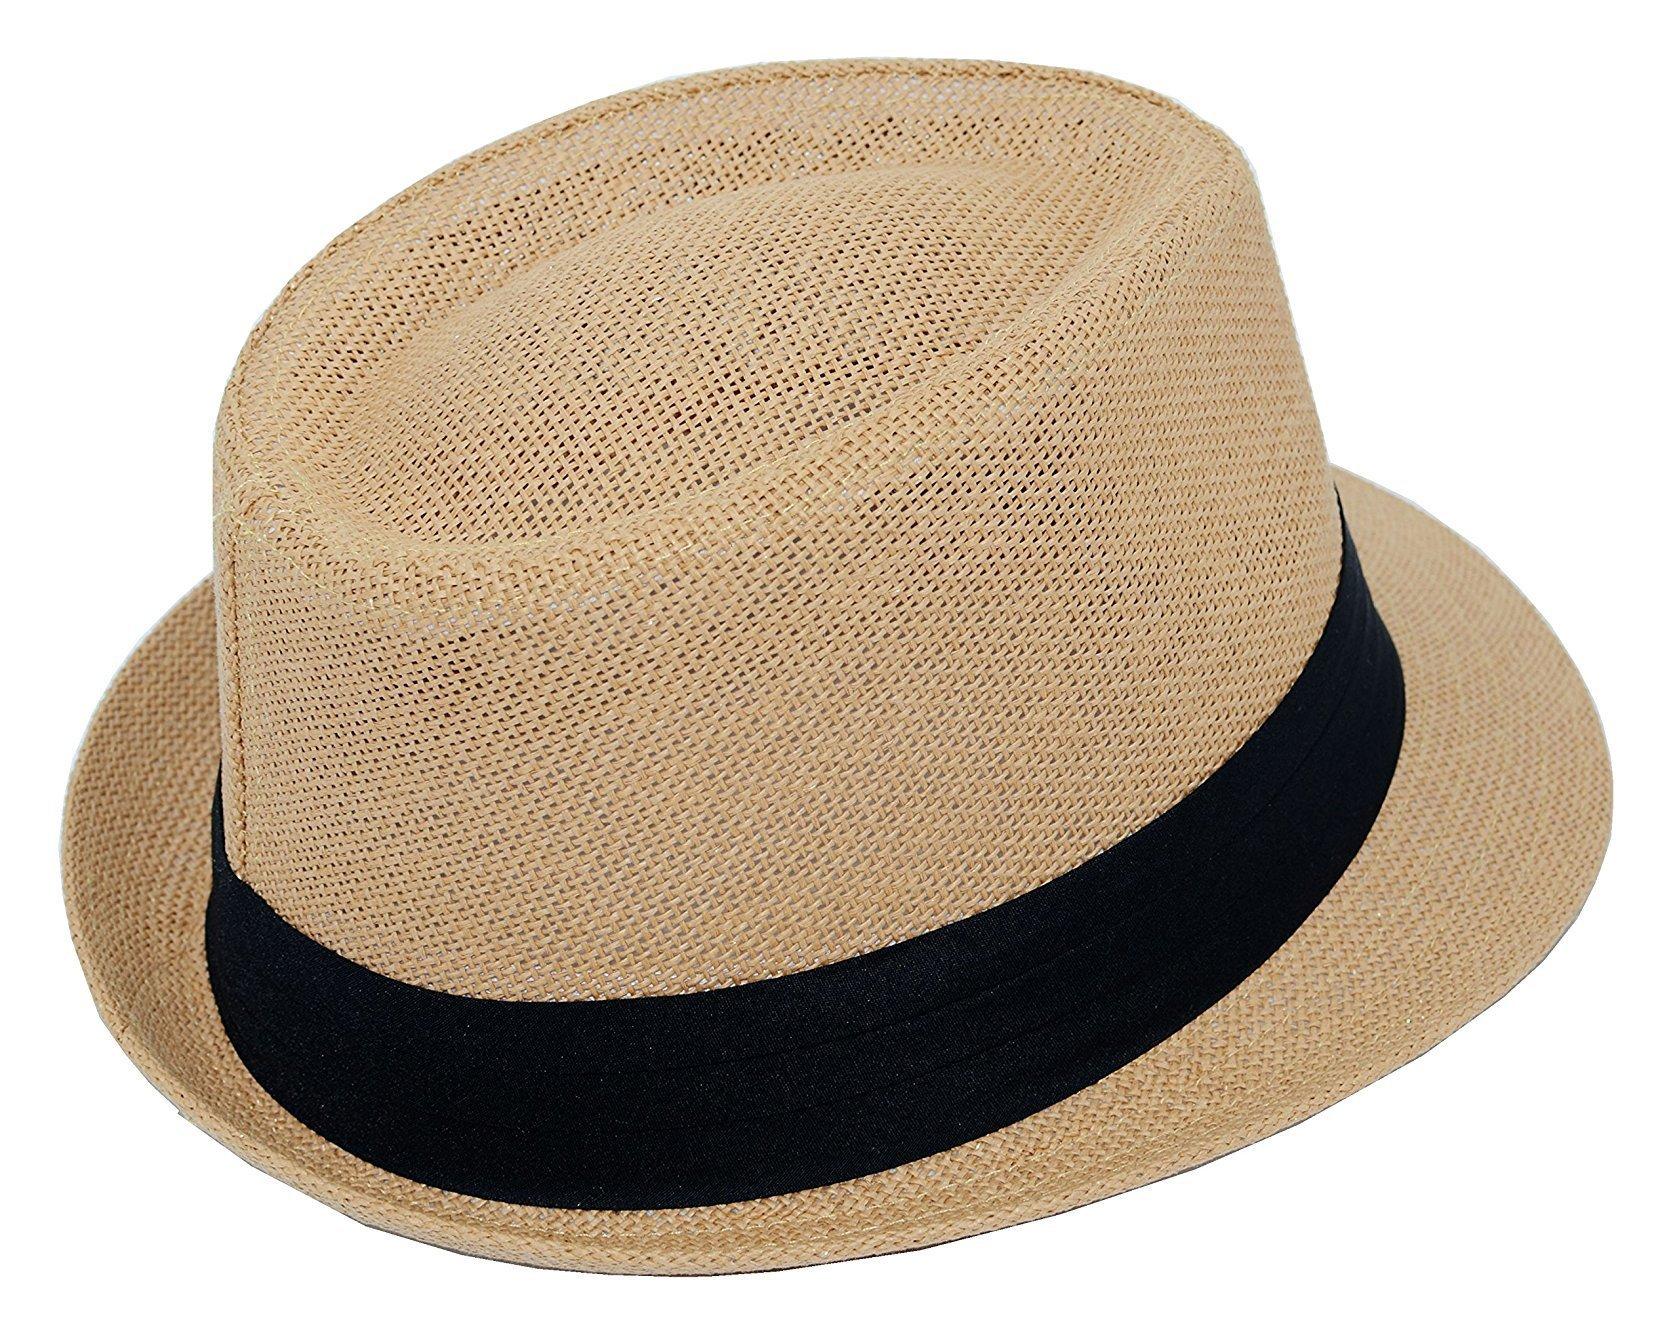 Good Quality Summer Beachside Straw Fedoras-Khaki-S/M